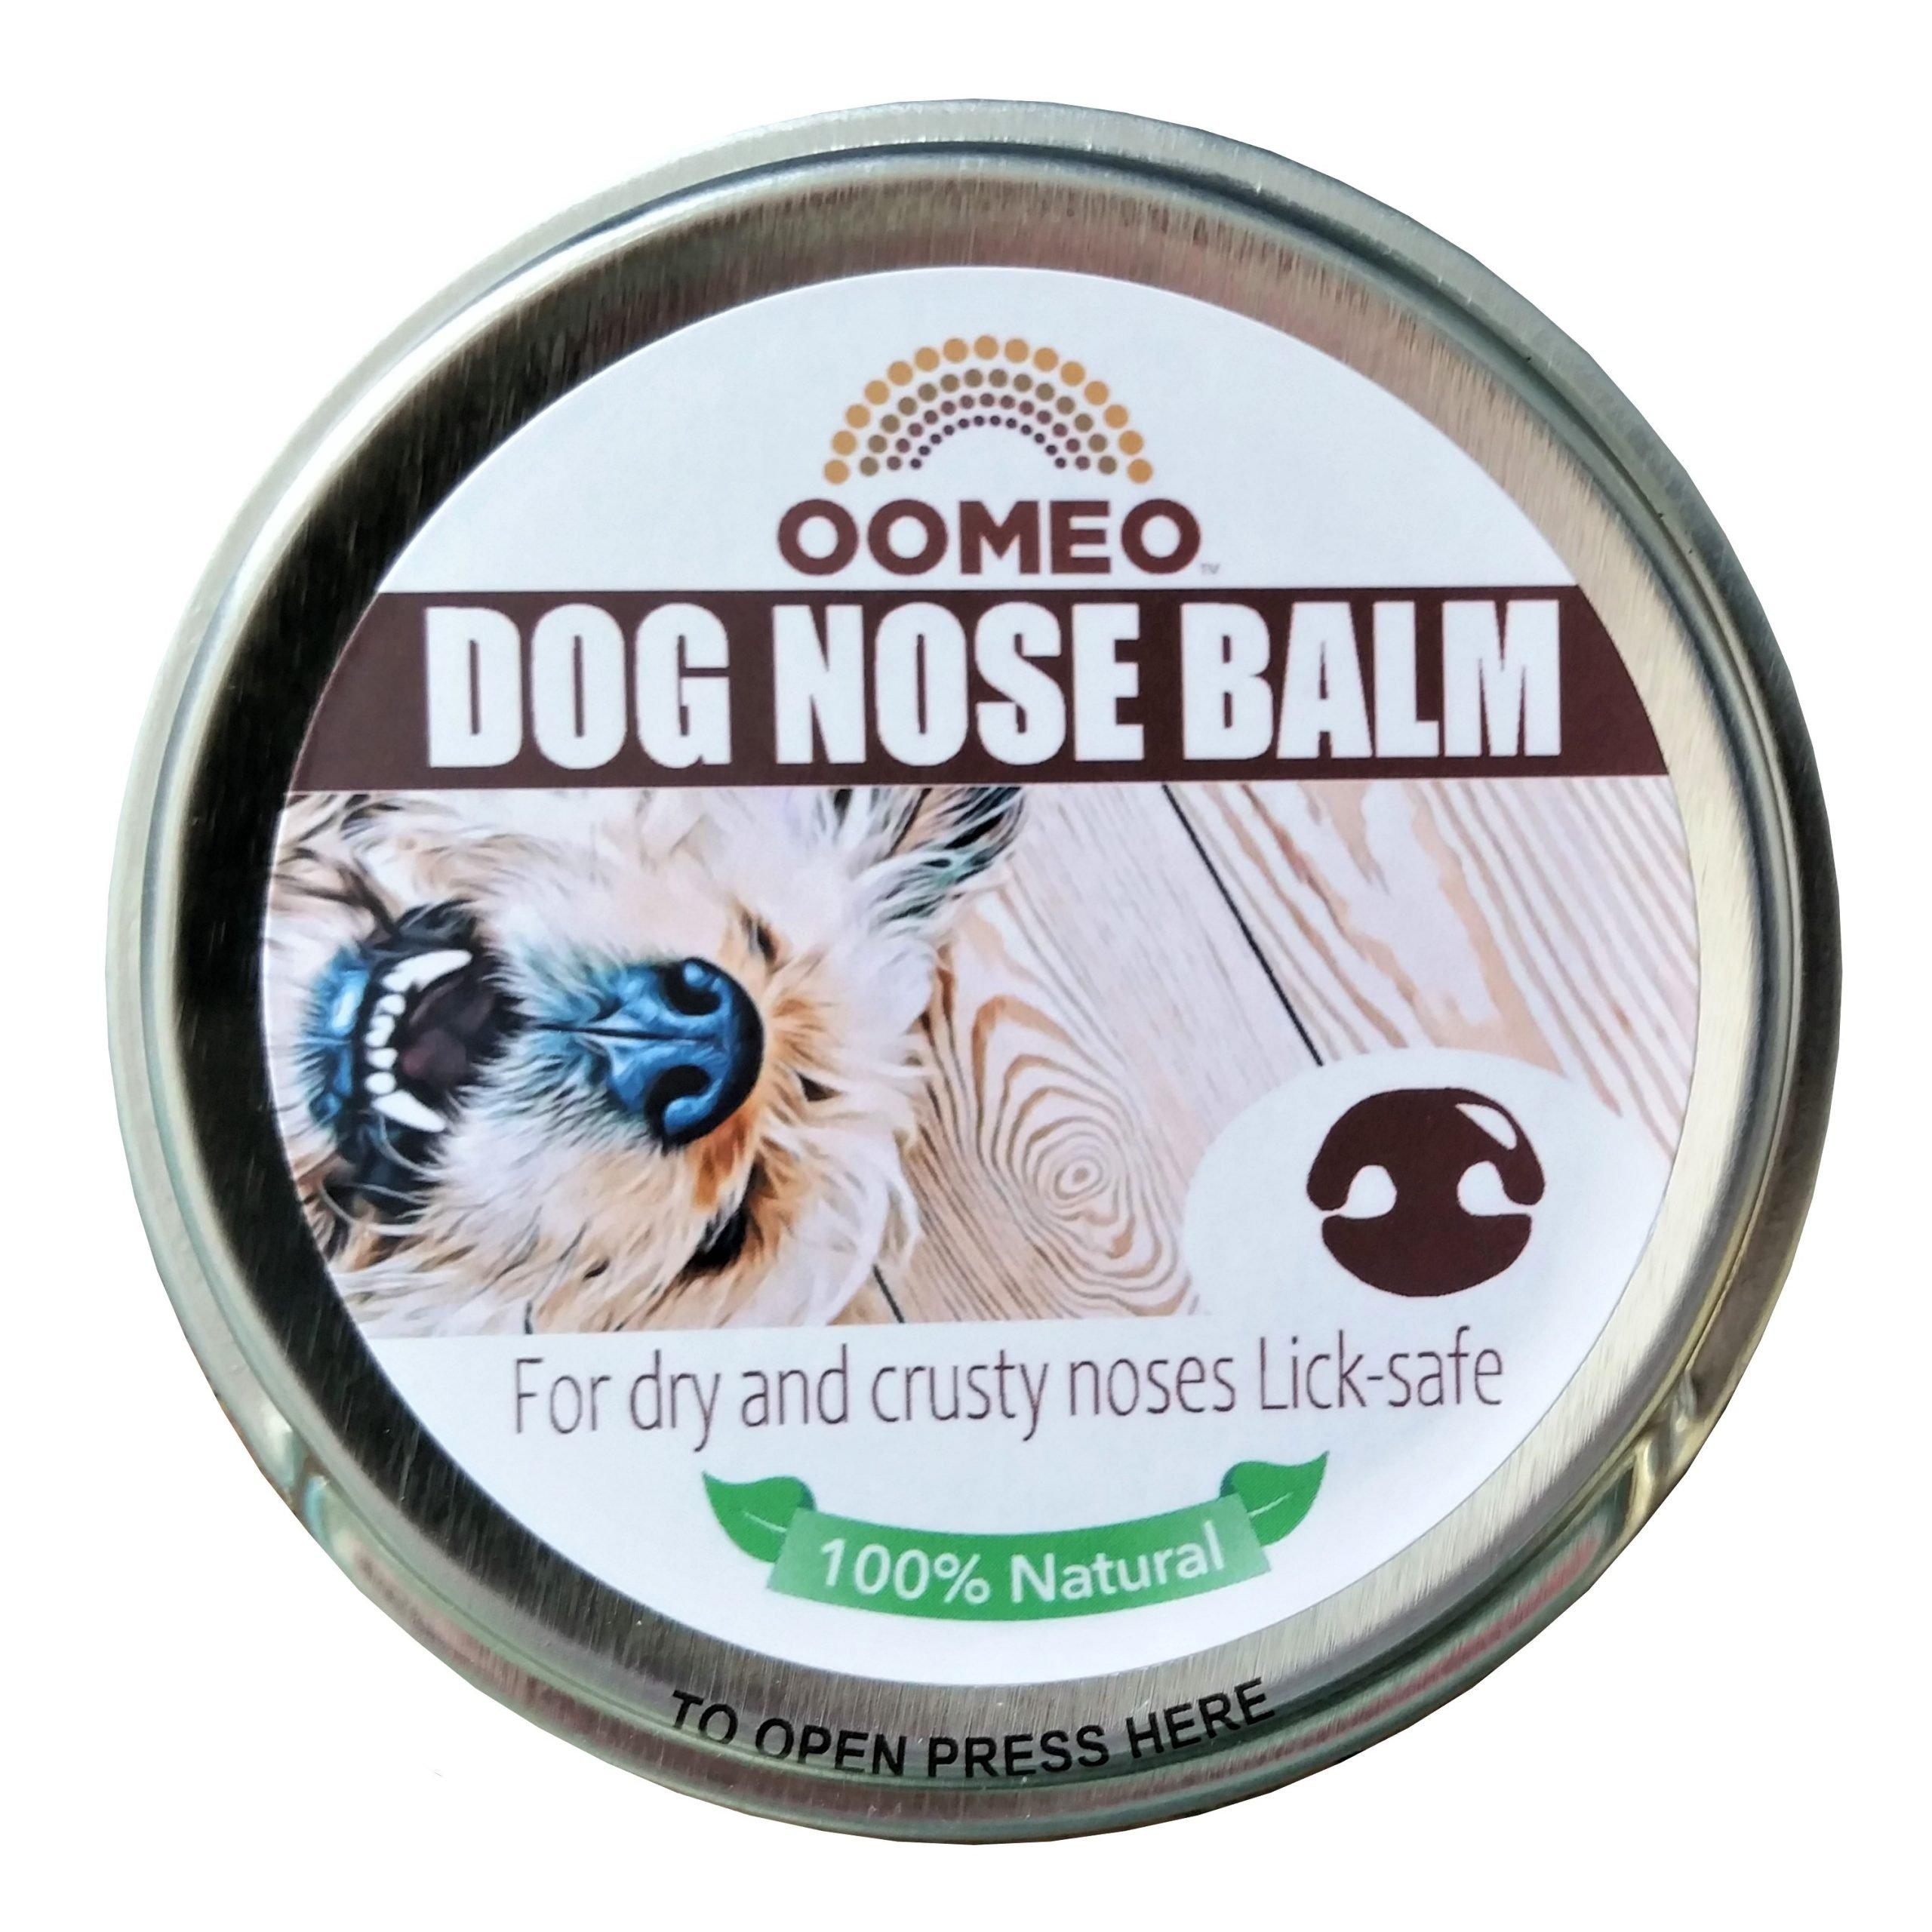 Wholesale dog nose balm (50ml)